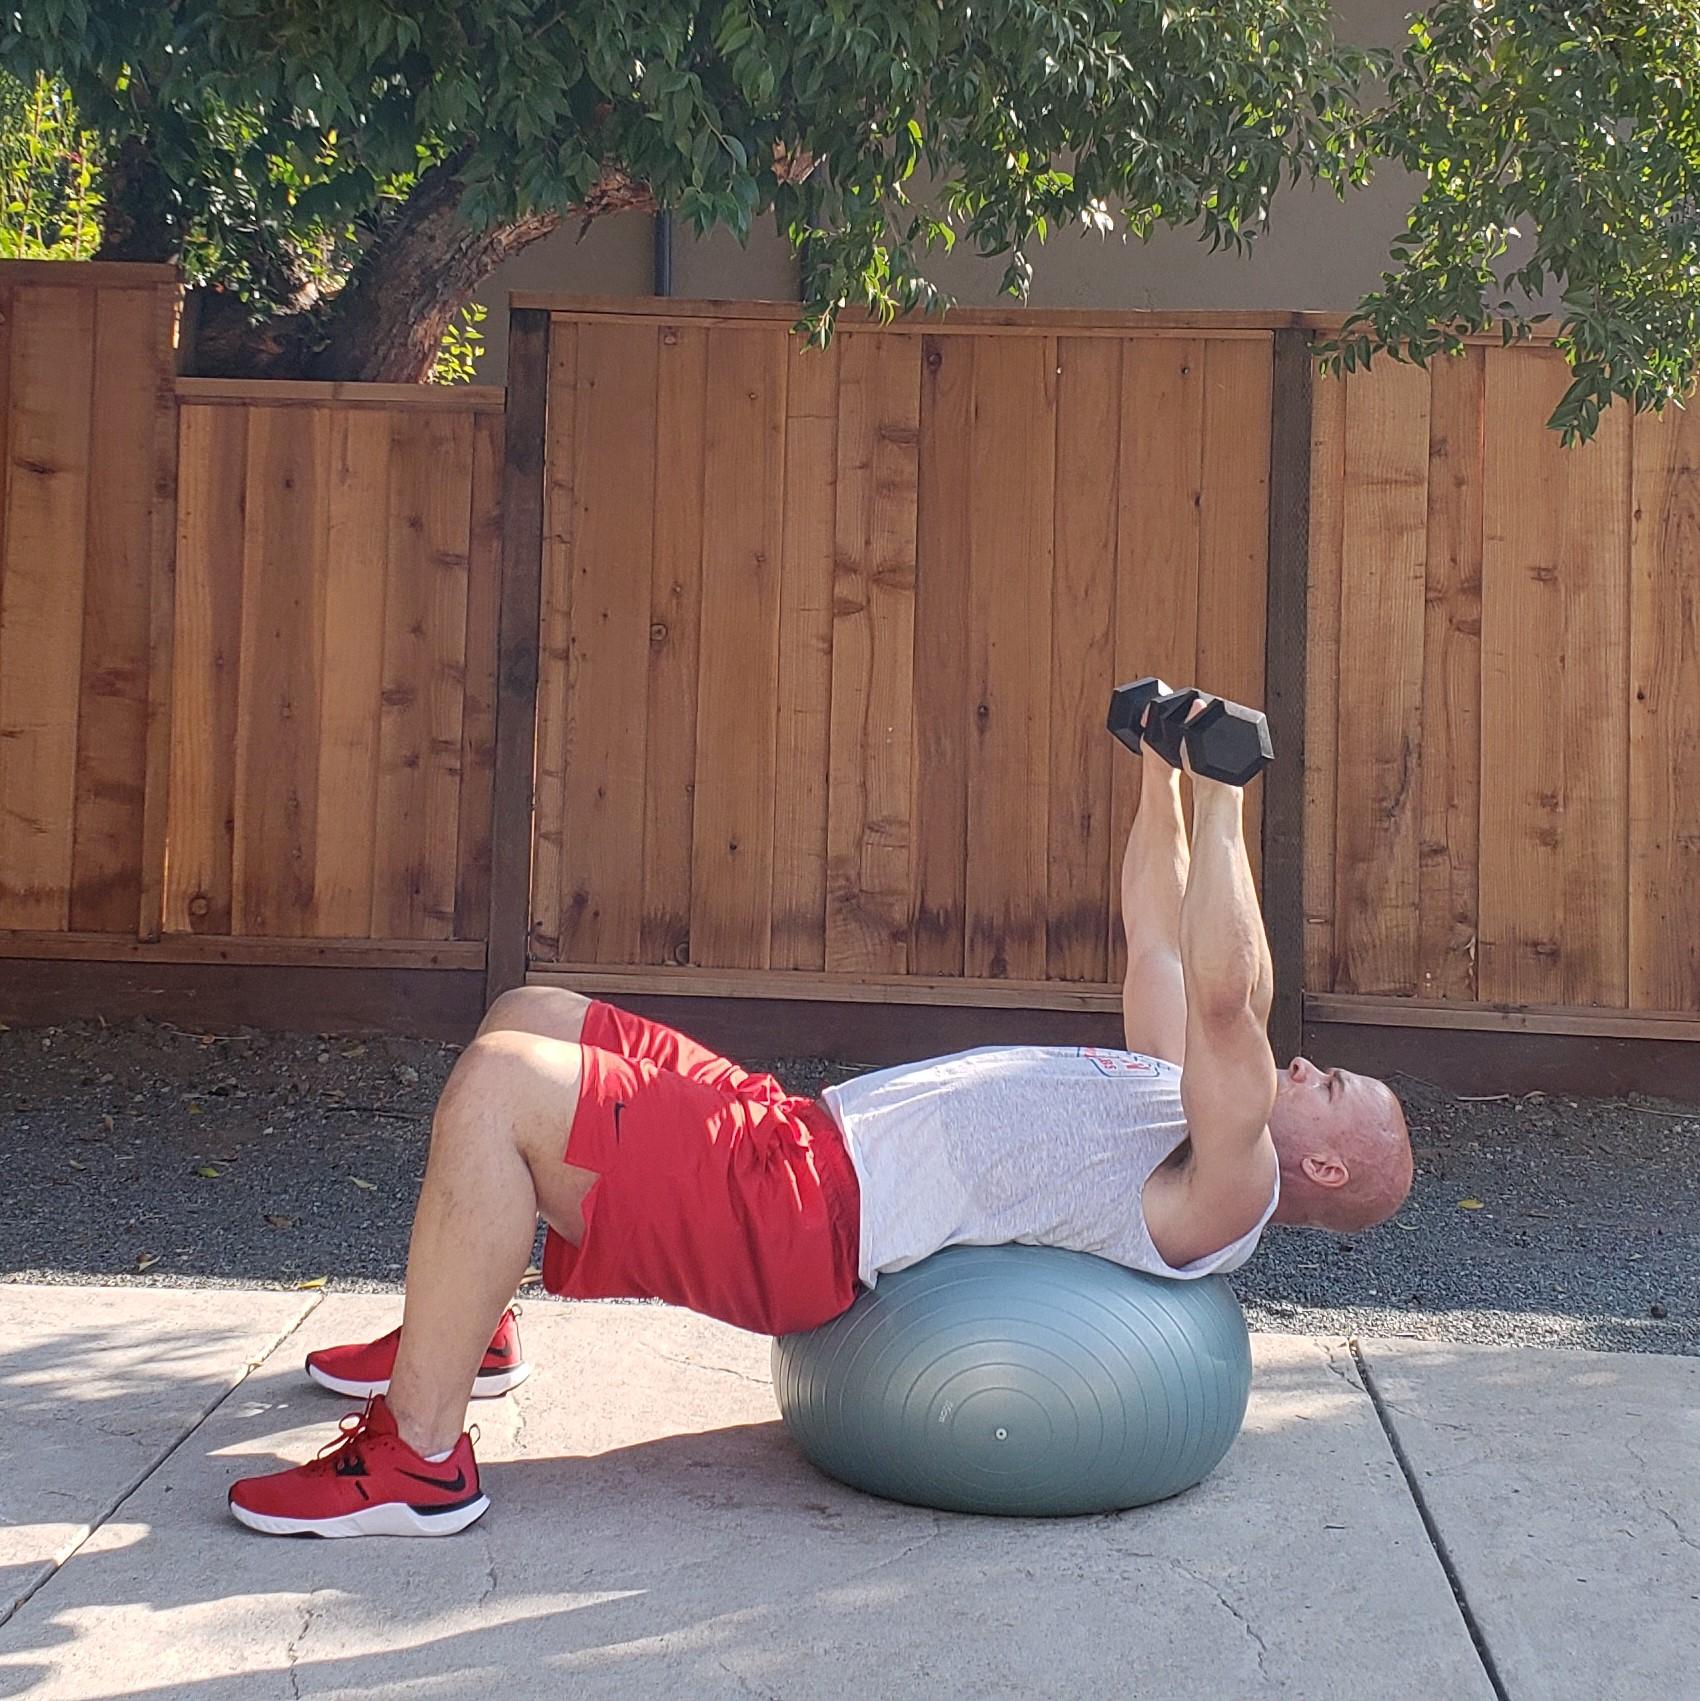 9 dumbbell presses 1 15 x 15 x 15 Workouts For Older Men HOME Gym Workout #4